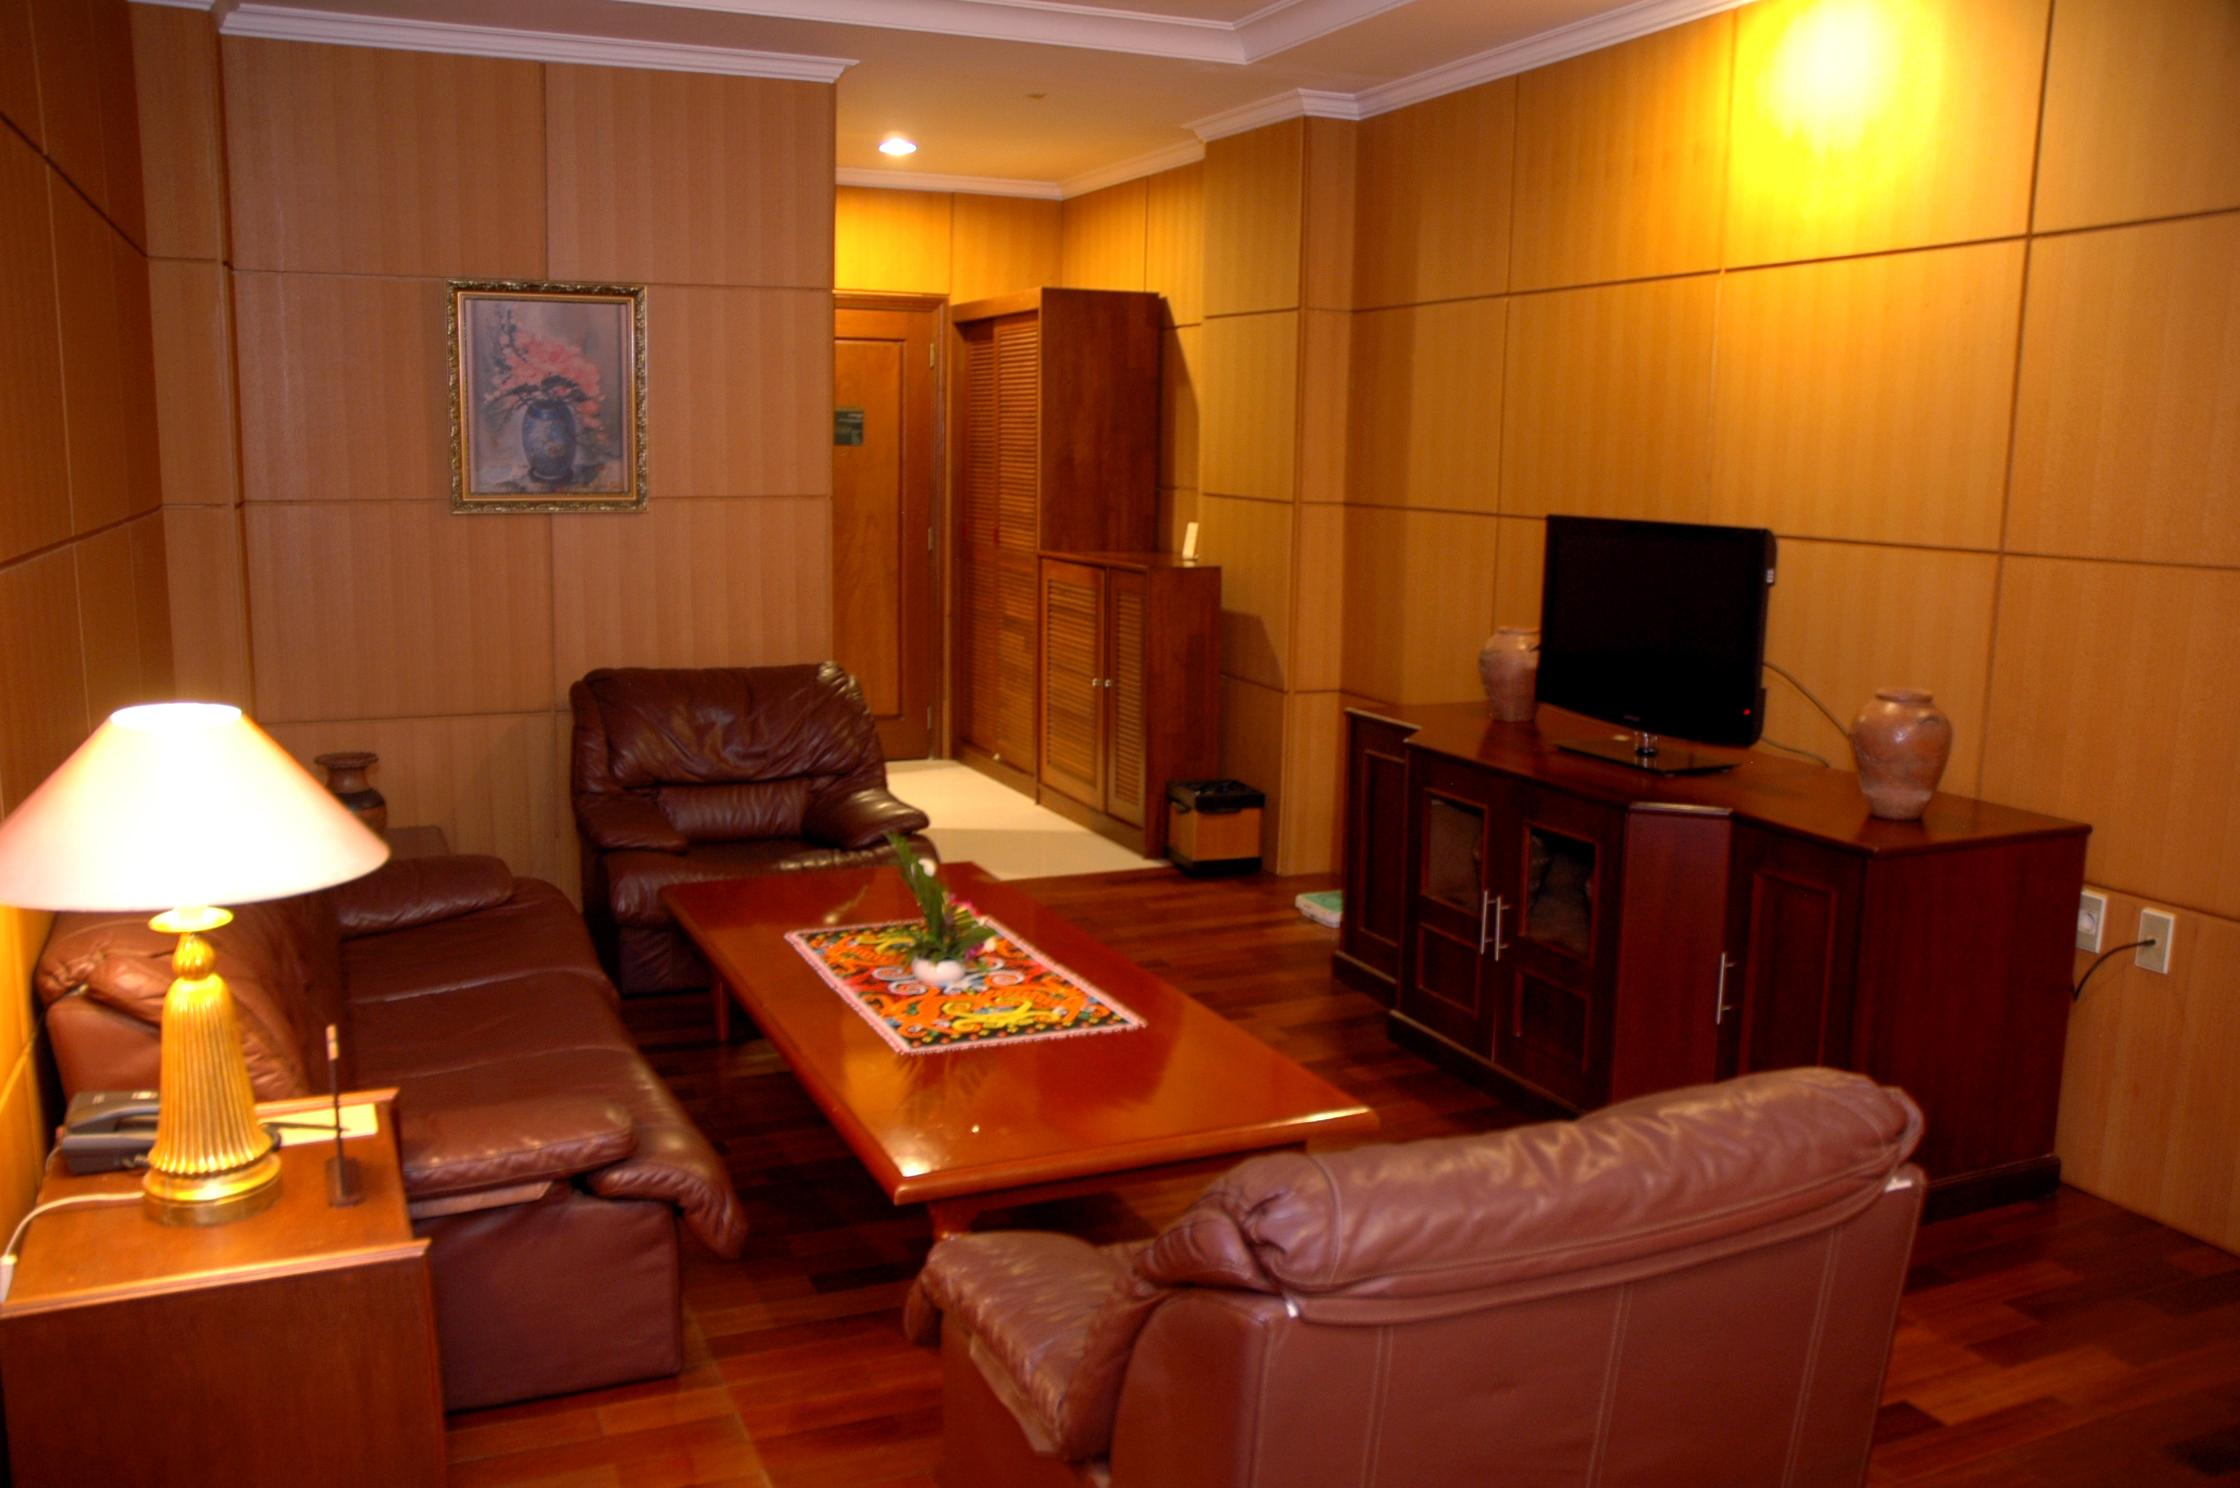 Senyiur suite room rooms bumi senyiur hotel for Living room suit